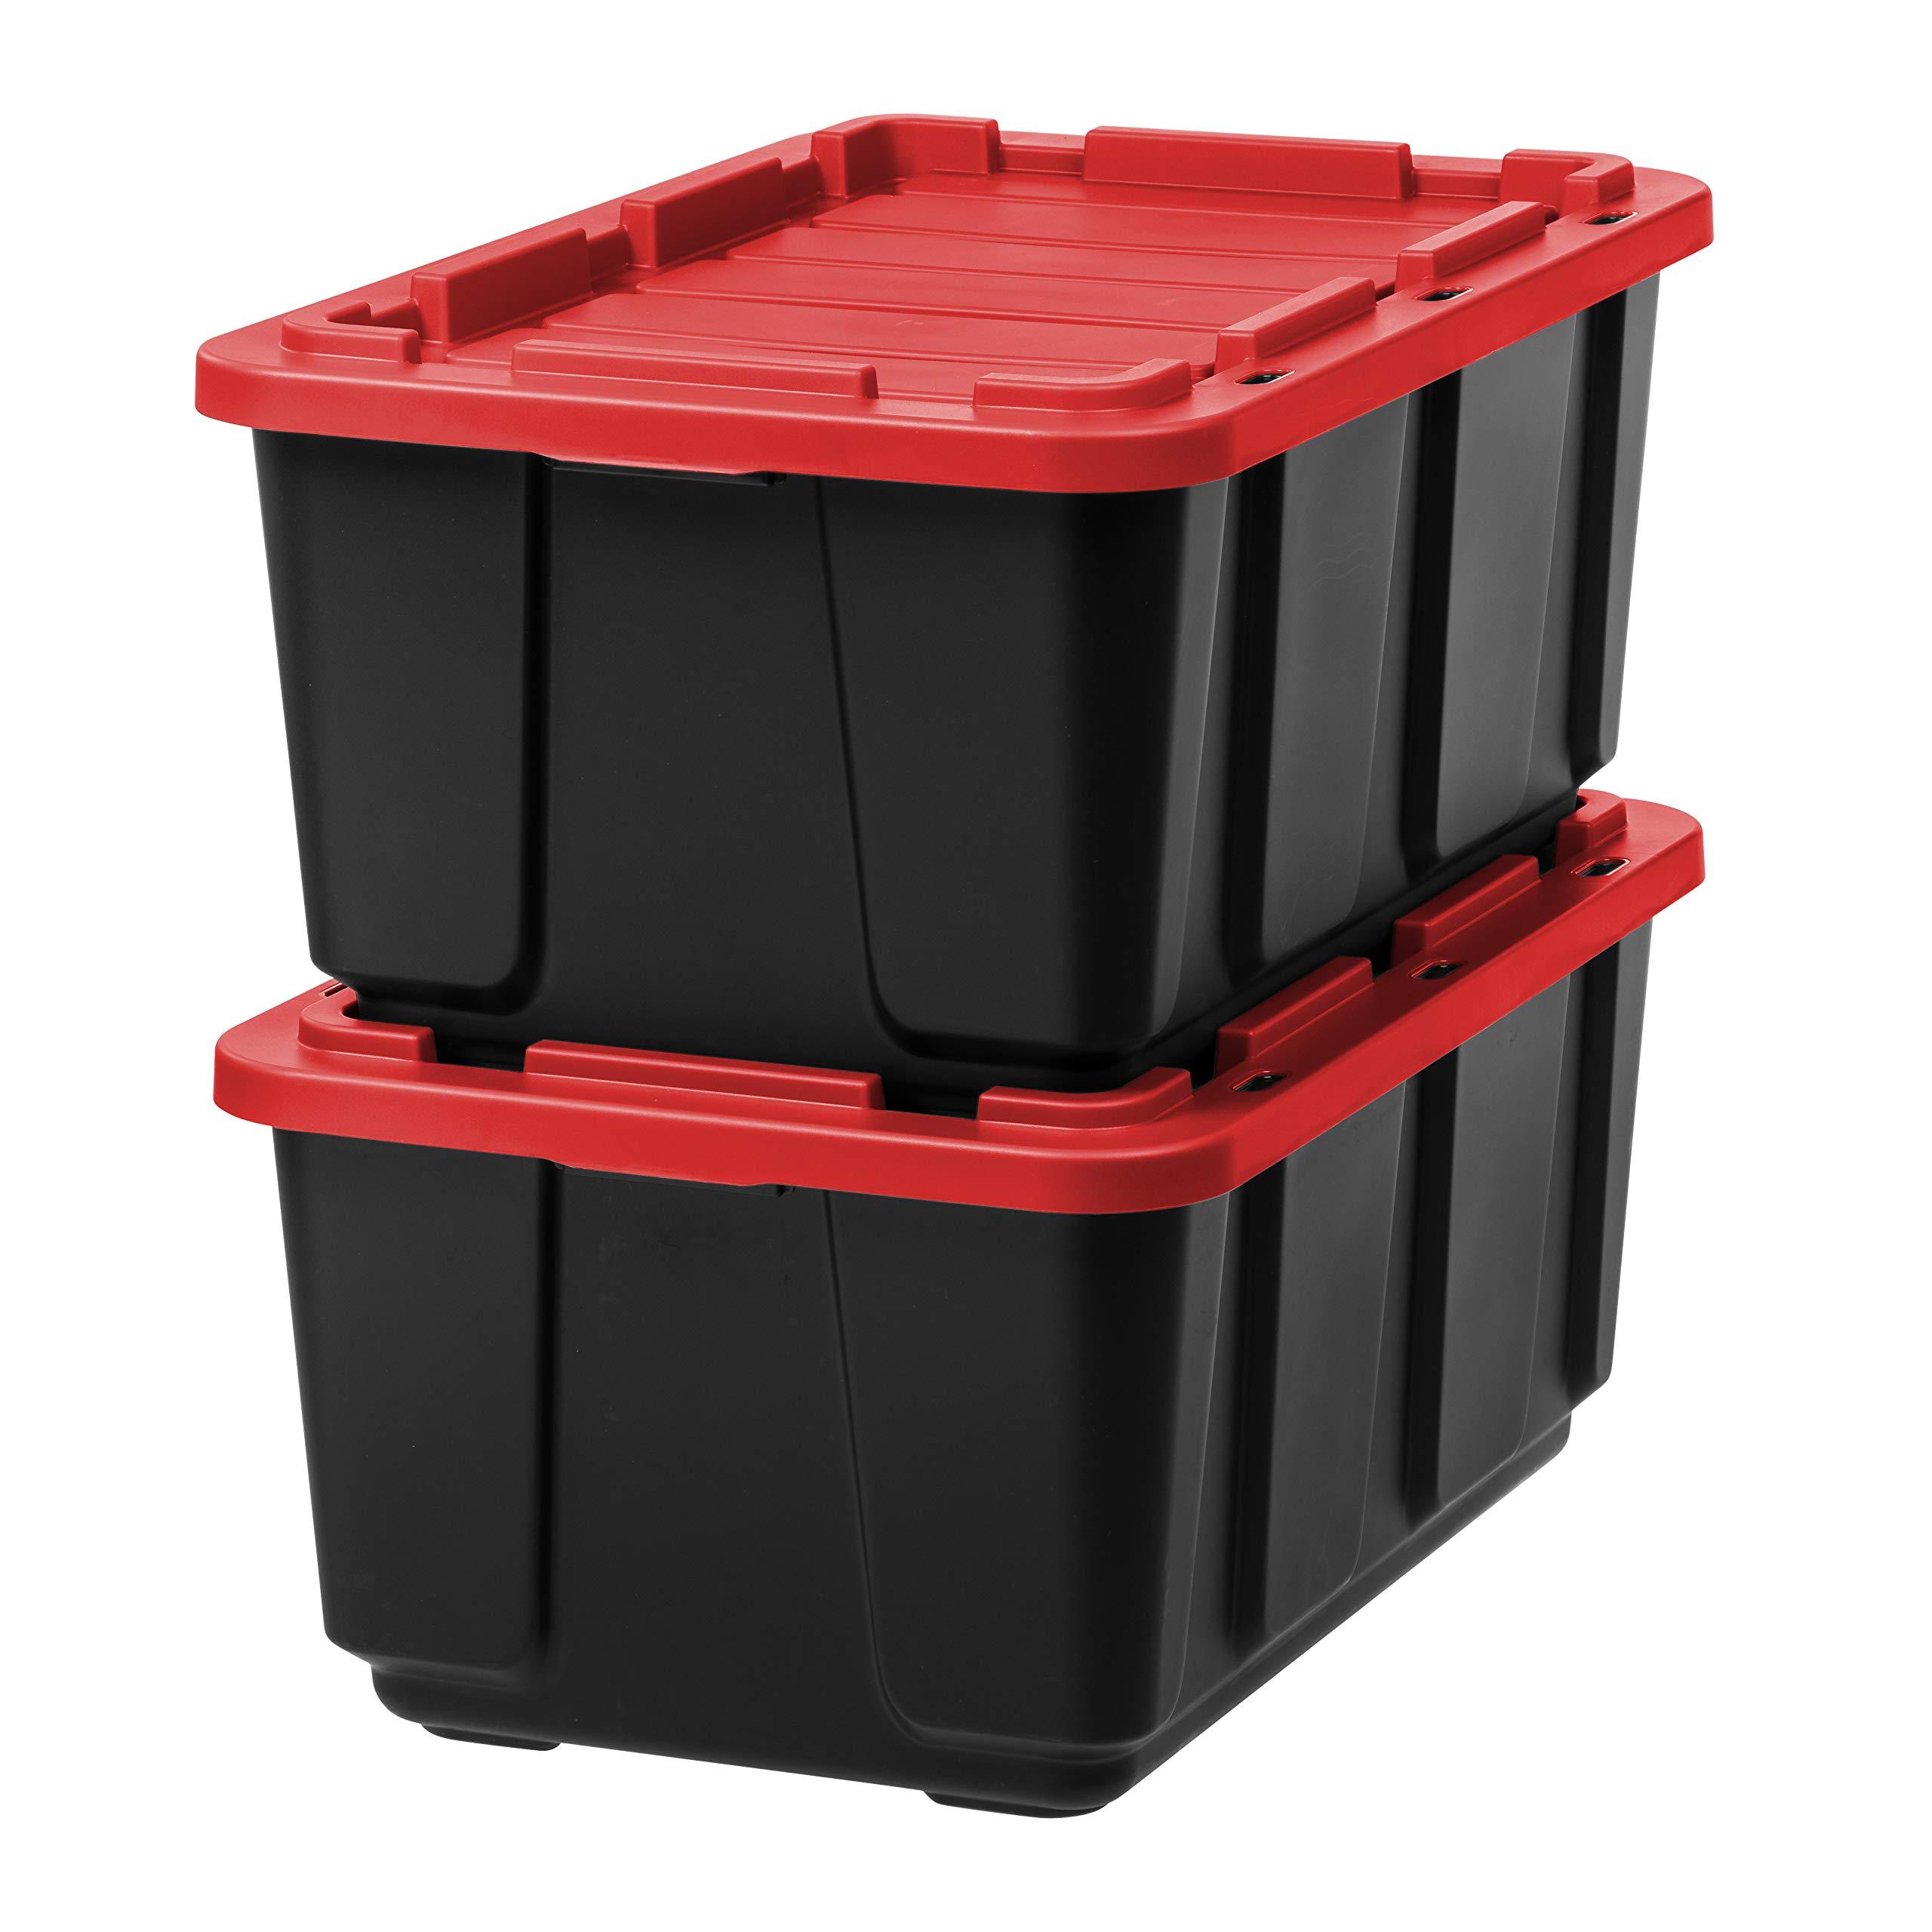 IRIS USA, Inc. UTB-27 27 Gallon Utility Tough Tote, 2 Pack, Red/Black by IRIS USA, Inc.